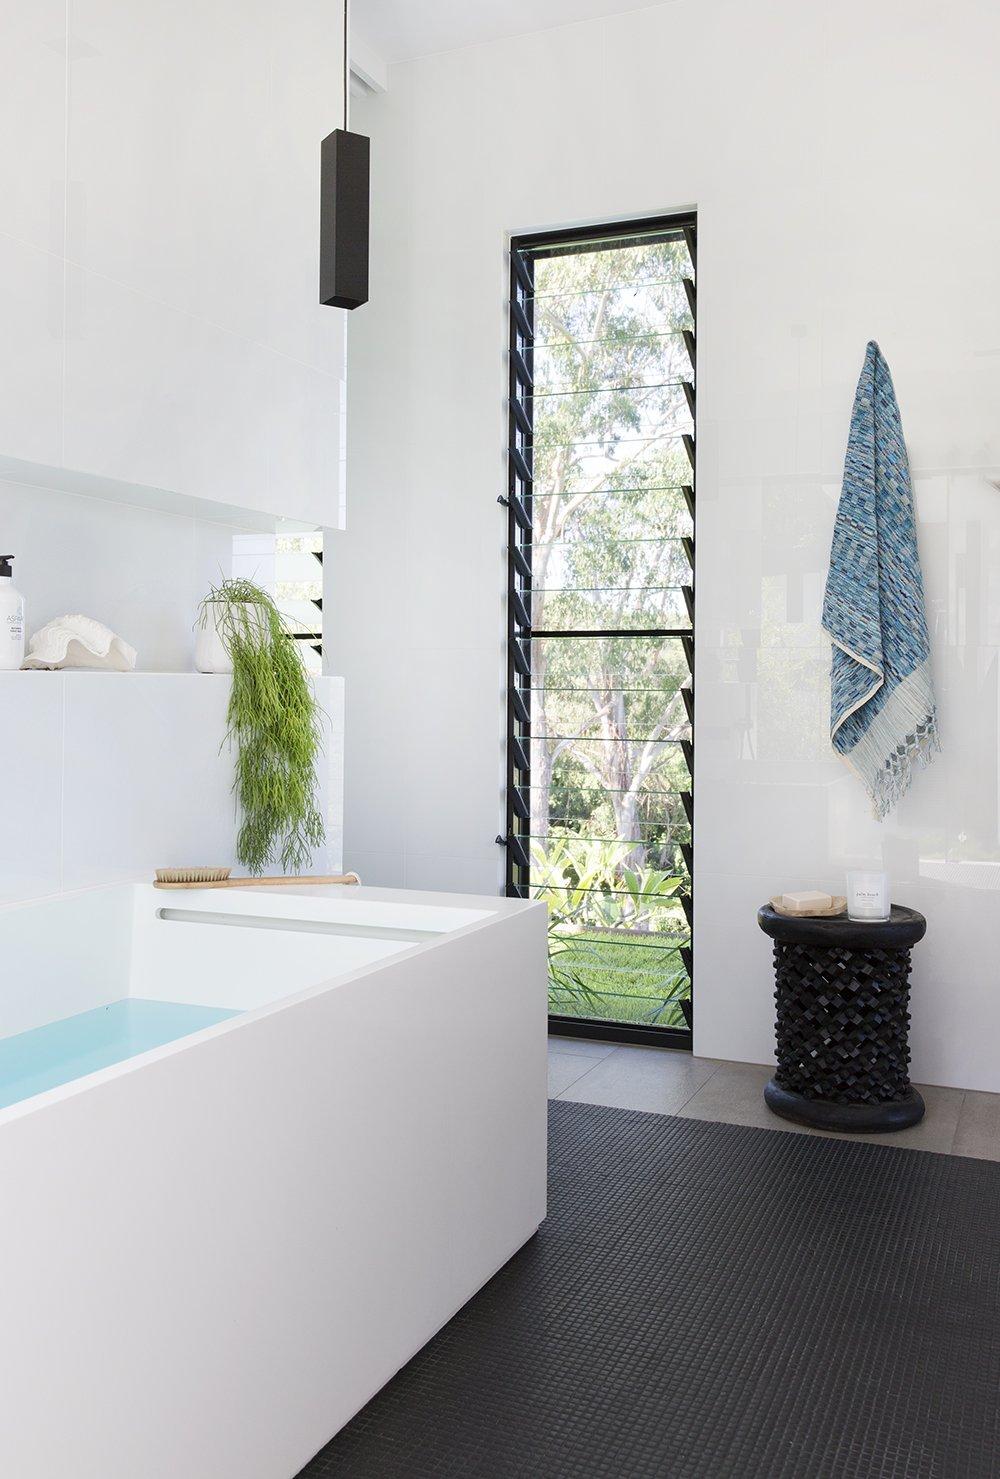 Organic bath towel from Aegean loom is luxurious as it is soft